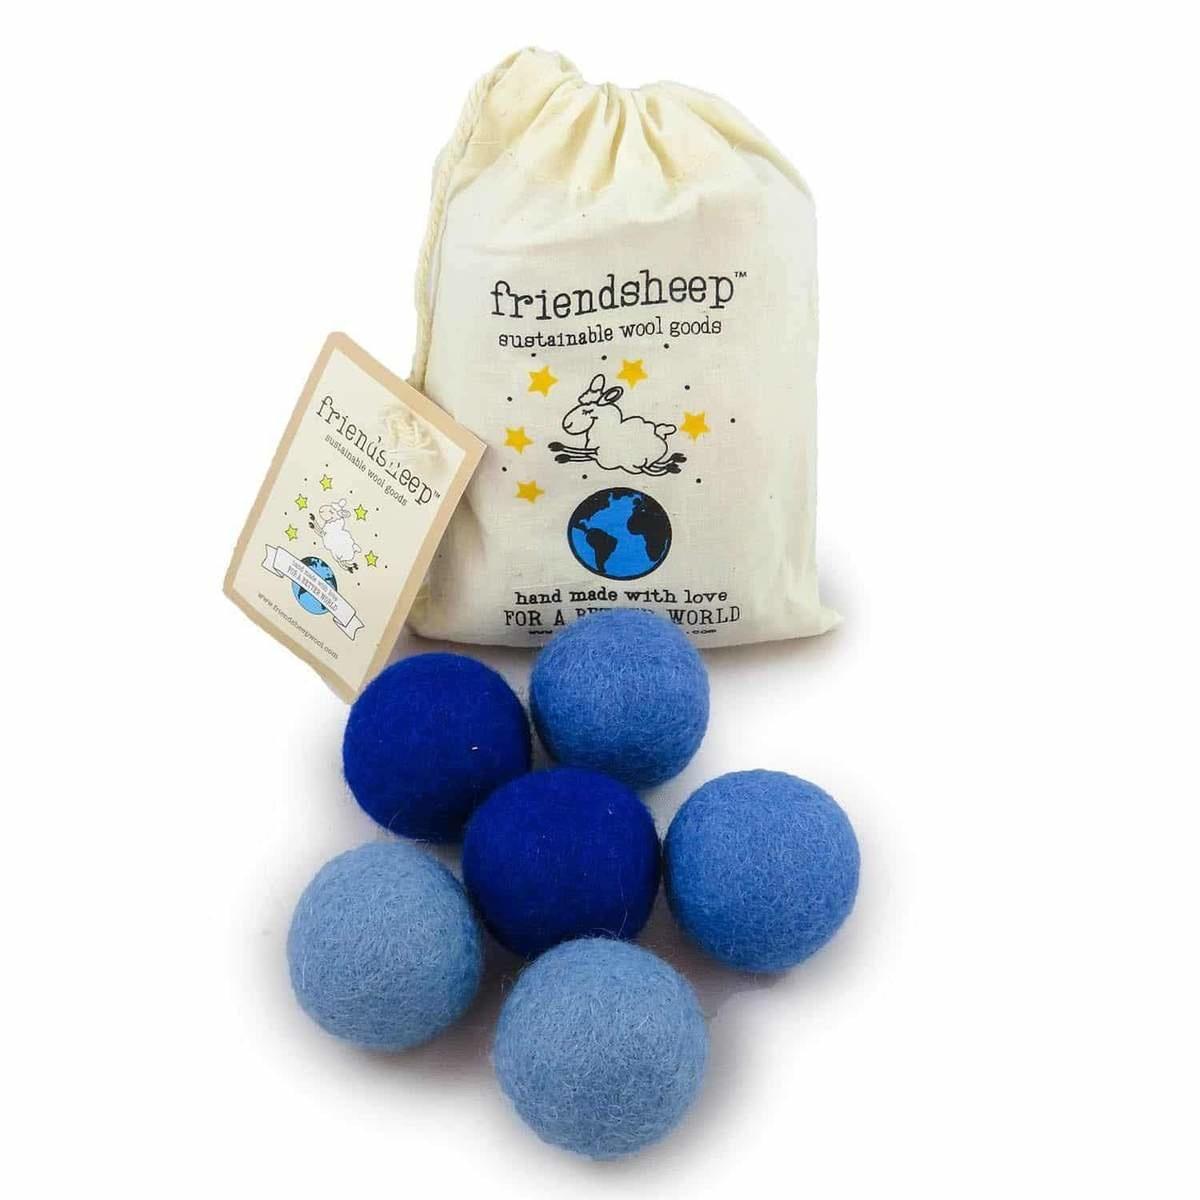 Friendsheep Friendsheep Eco Balls Blue 6 pack